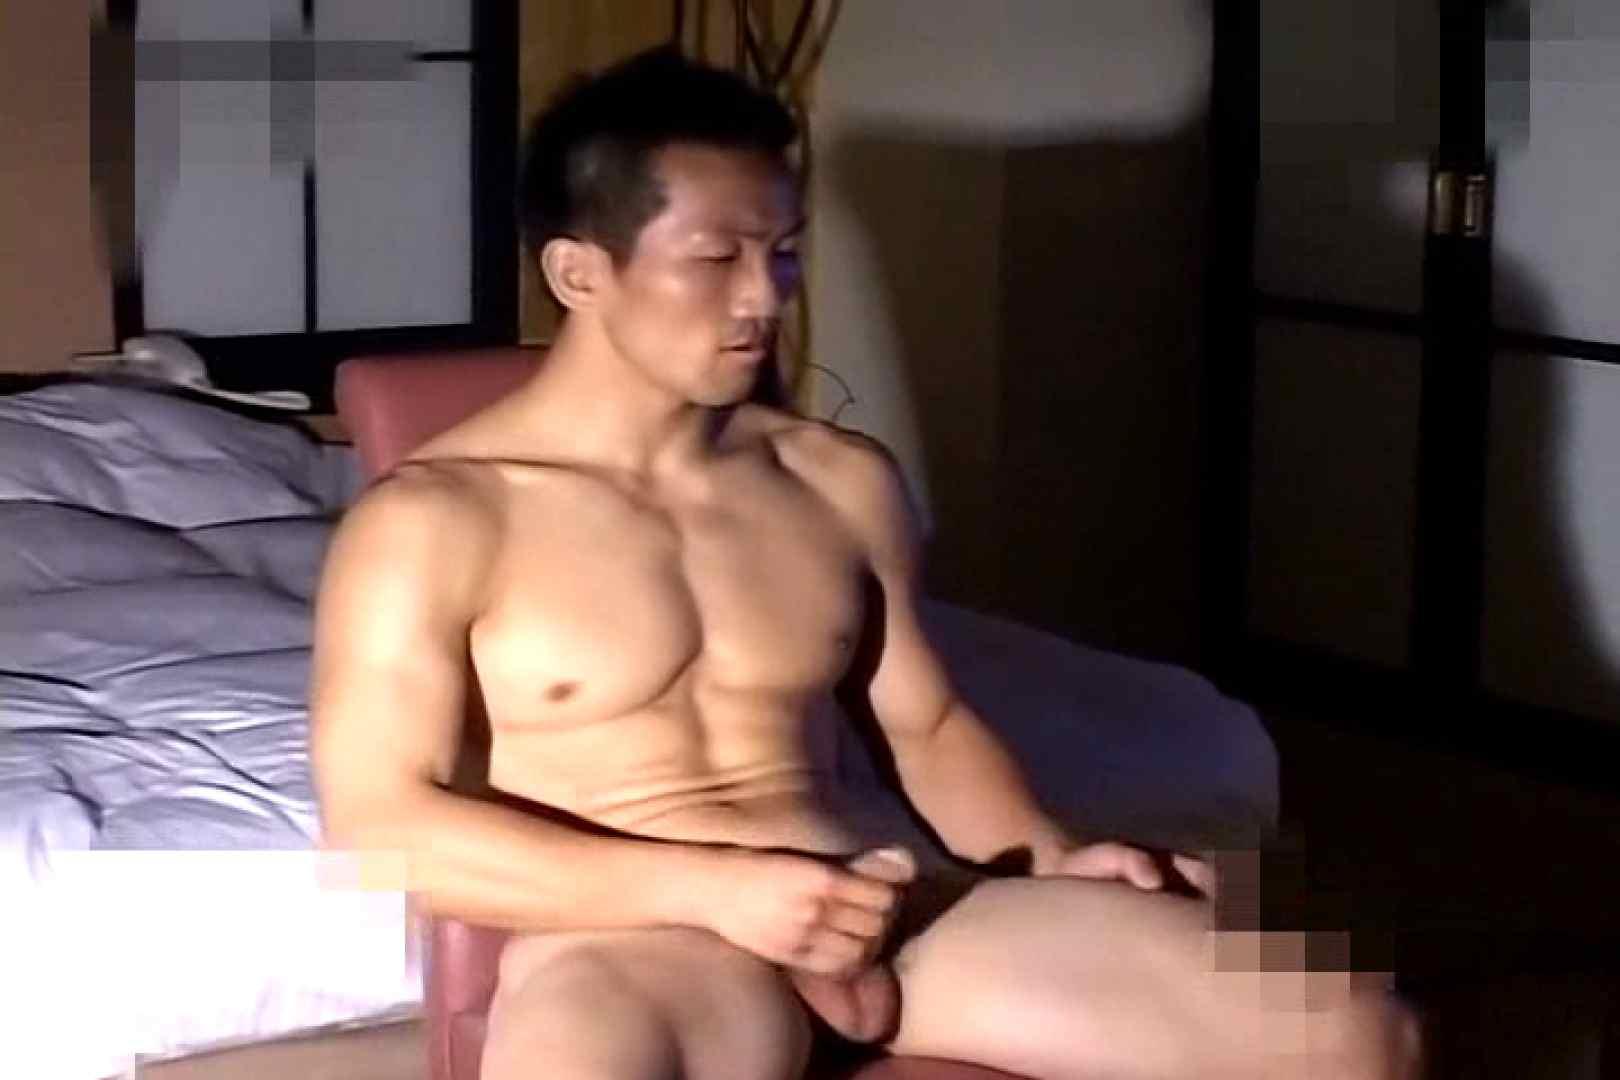 Beautiful muscle モッコリ野郎達!Vol.06 オナニー編 ちんぽ画像 90枚 23